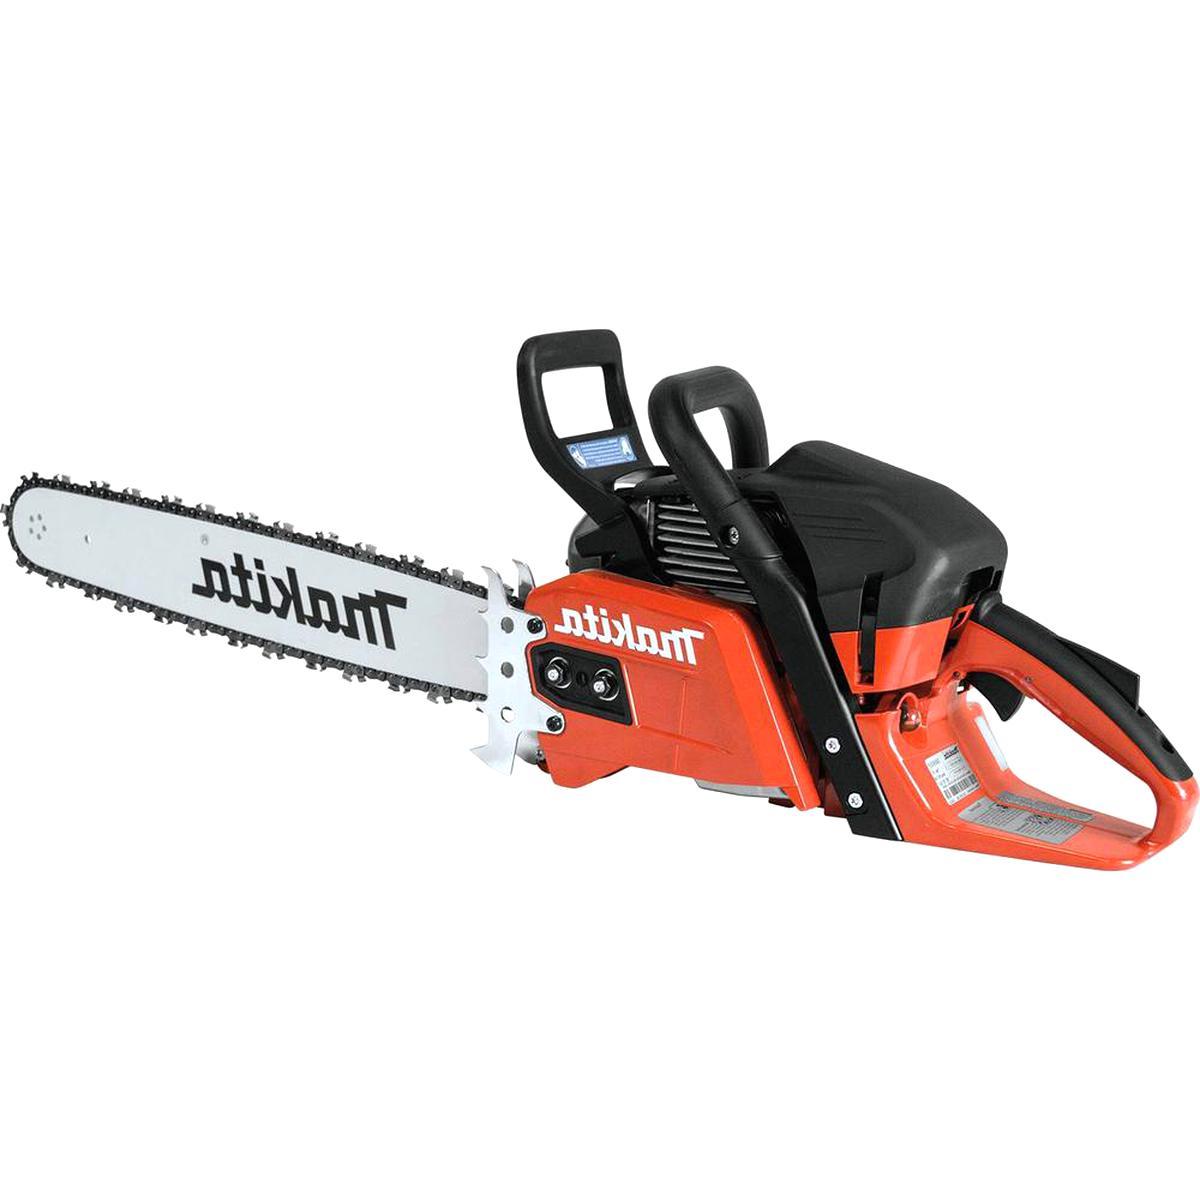 makita chainsaw for sale